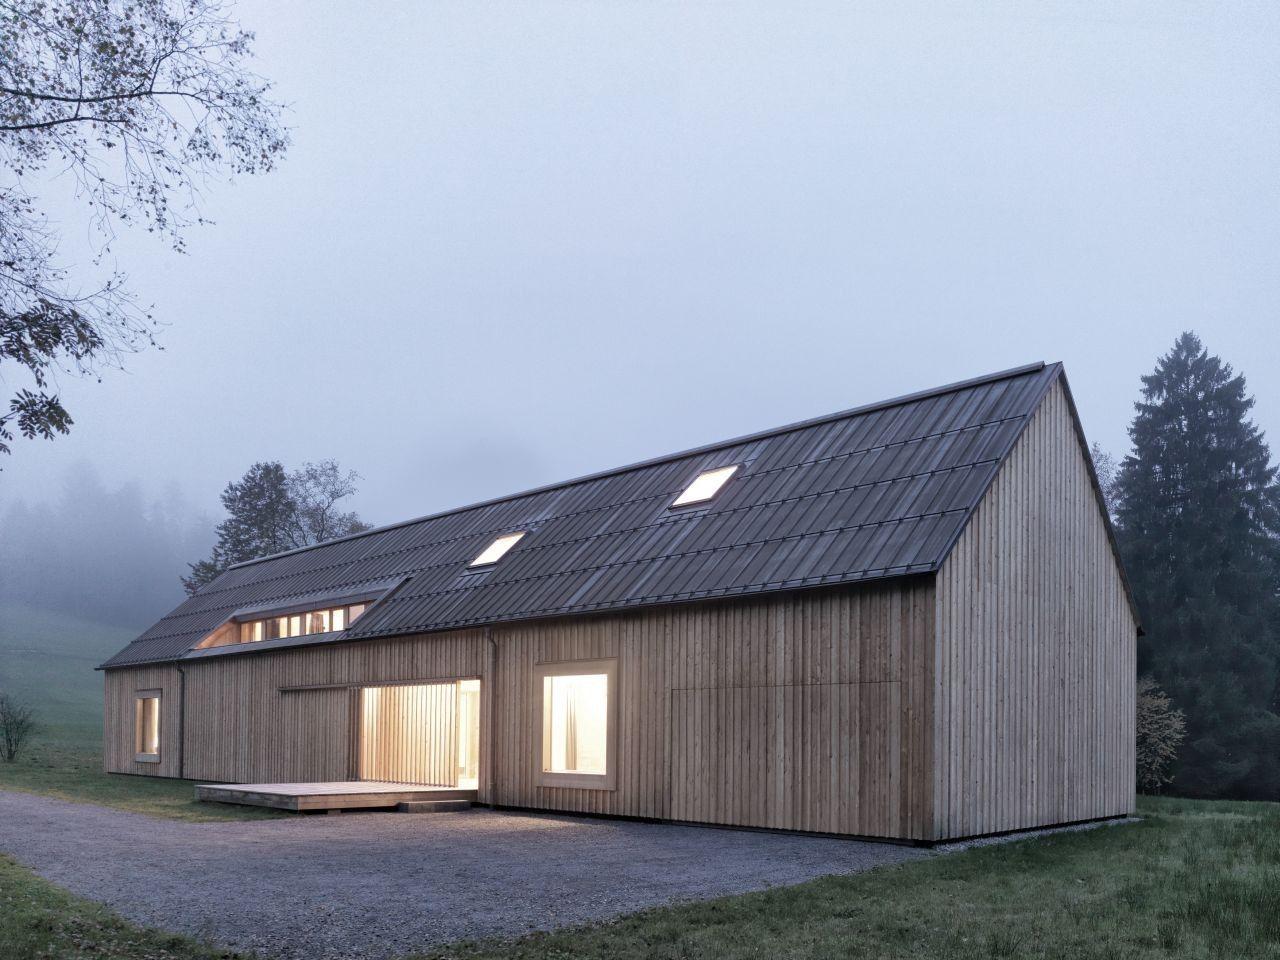 Modern Rustikale Bader ~ Gallery of haus am moor bernardo bader architects